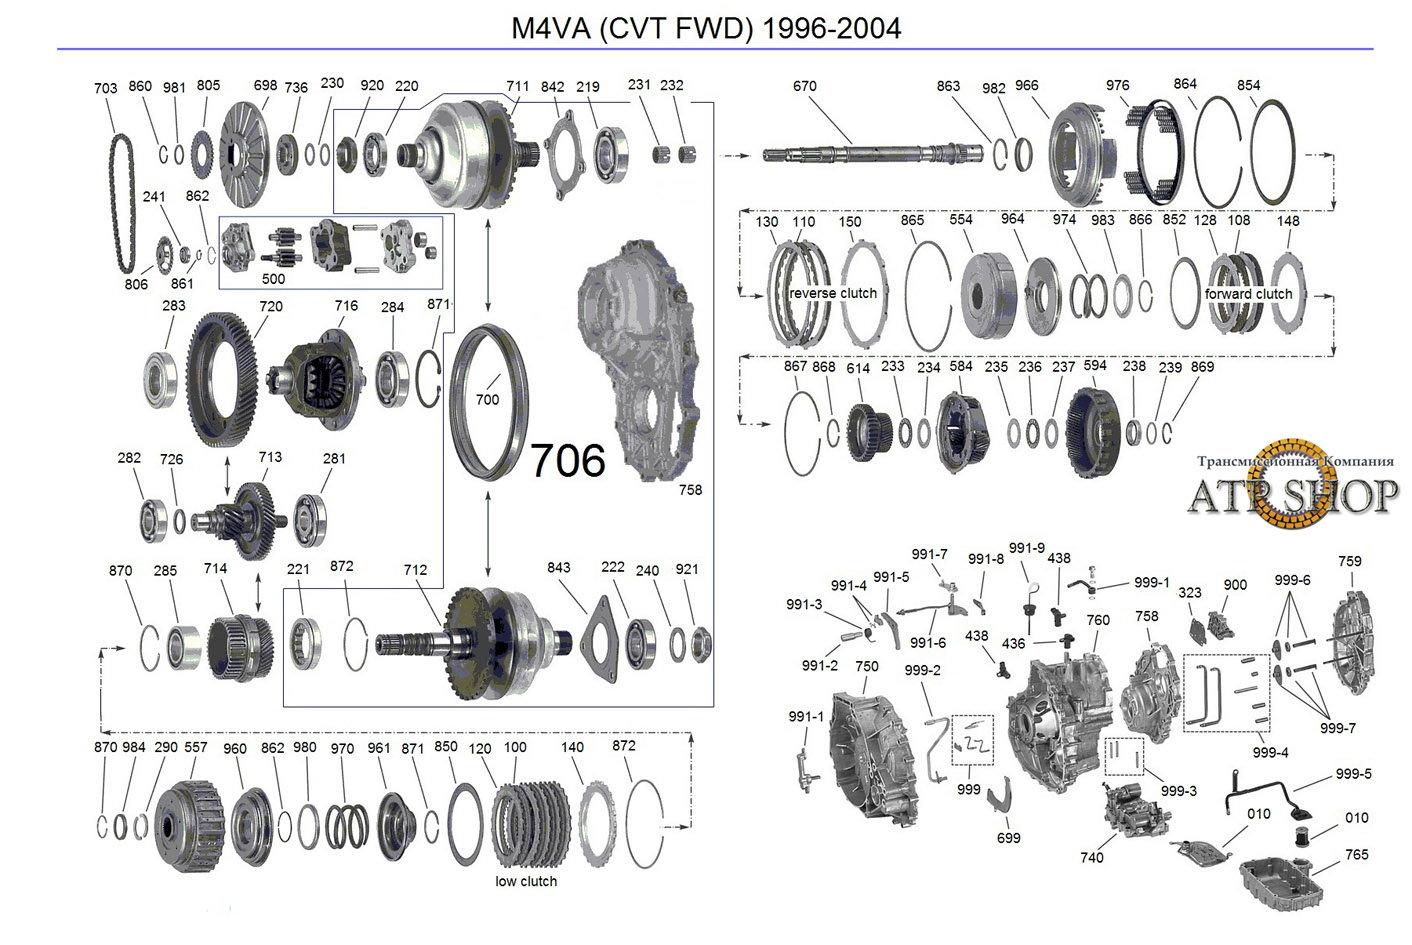 2005 Hybrid Transmission Rebuild